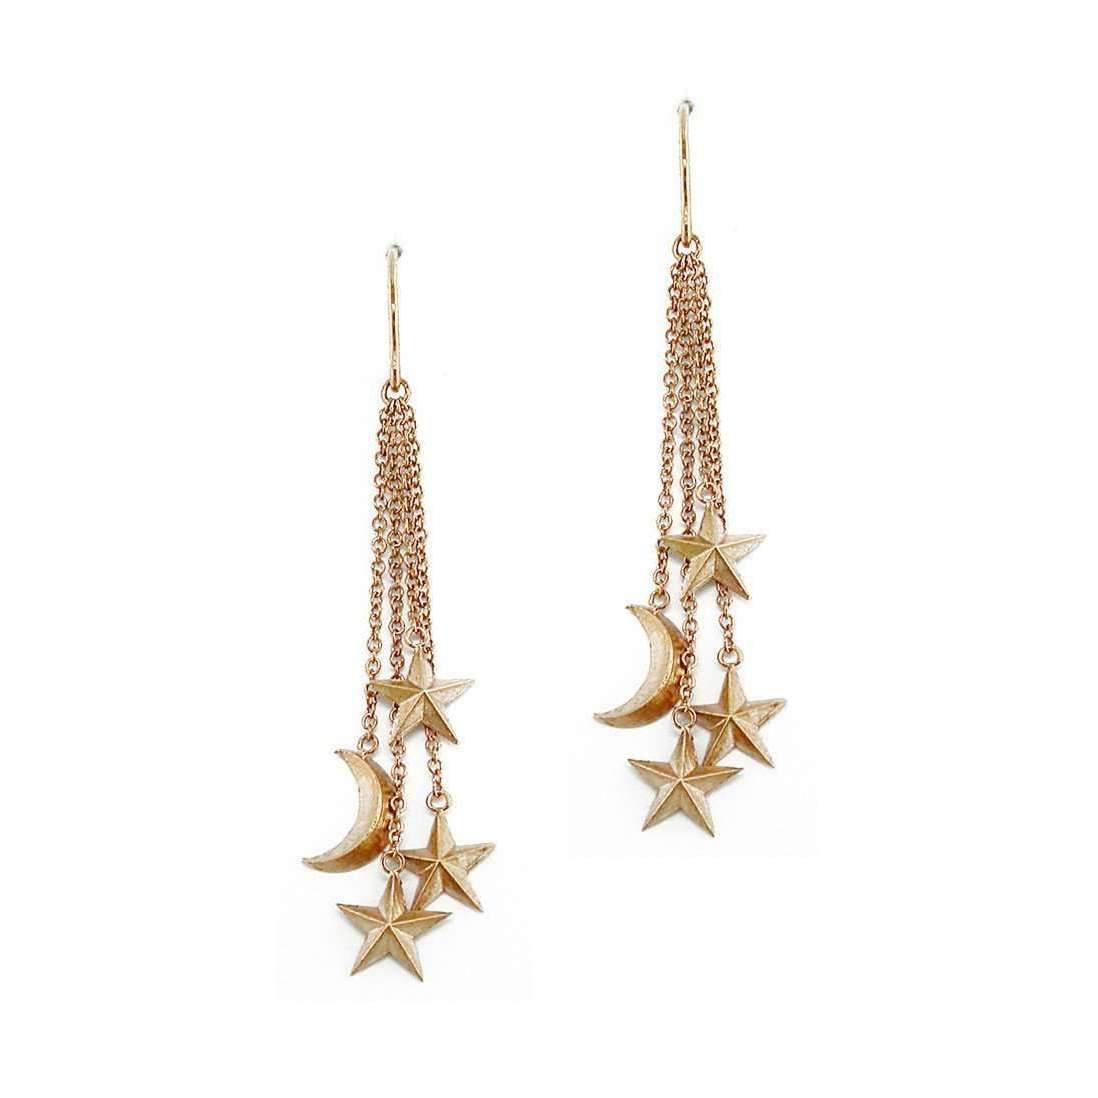 London Road Jewellery Portobello Rose Gold Starry Night Moon Stud Earrings F7qH9j2